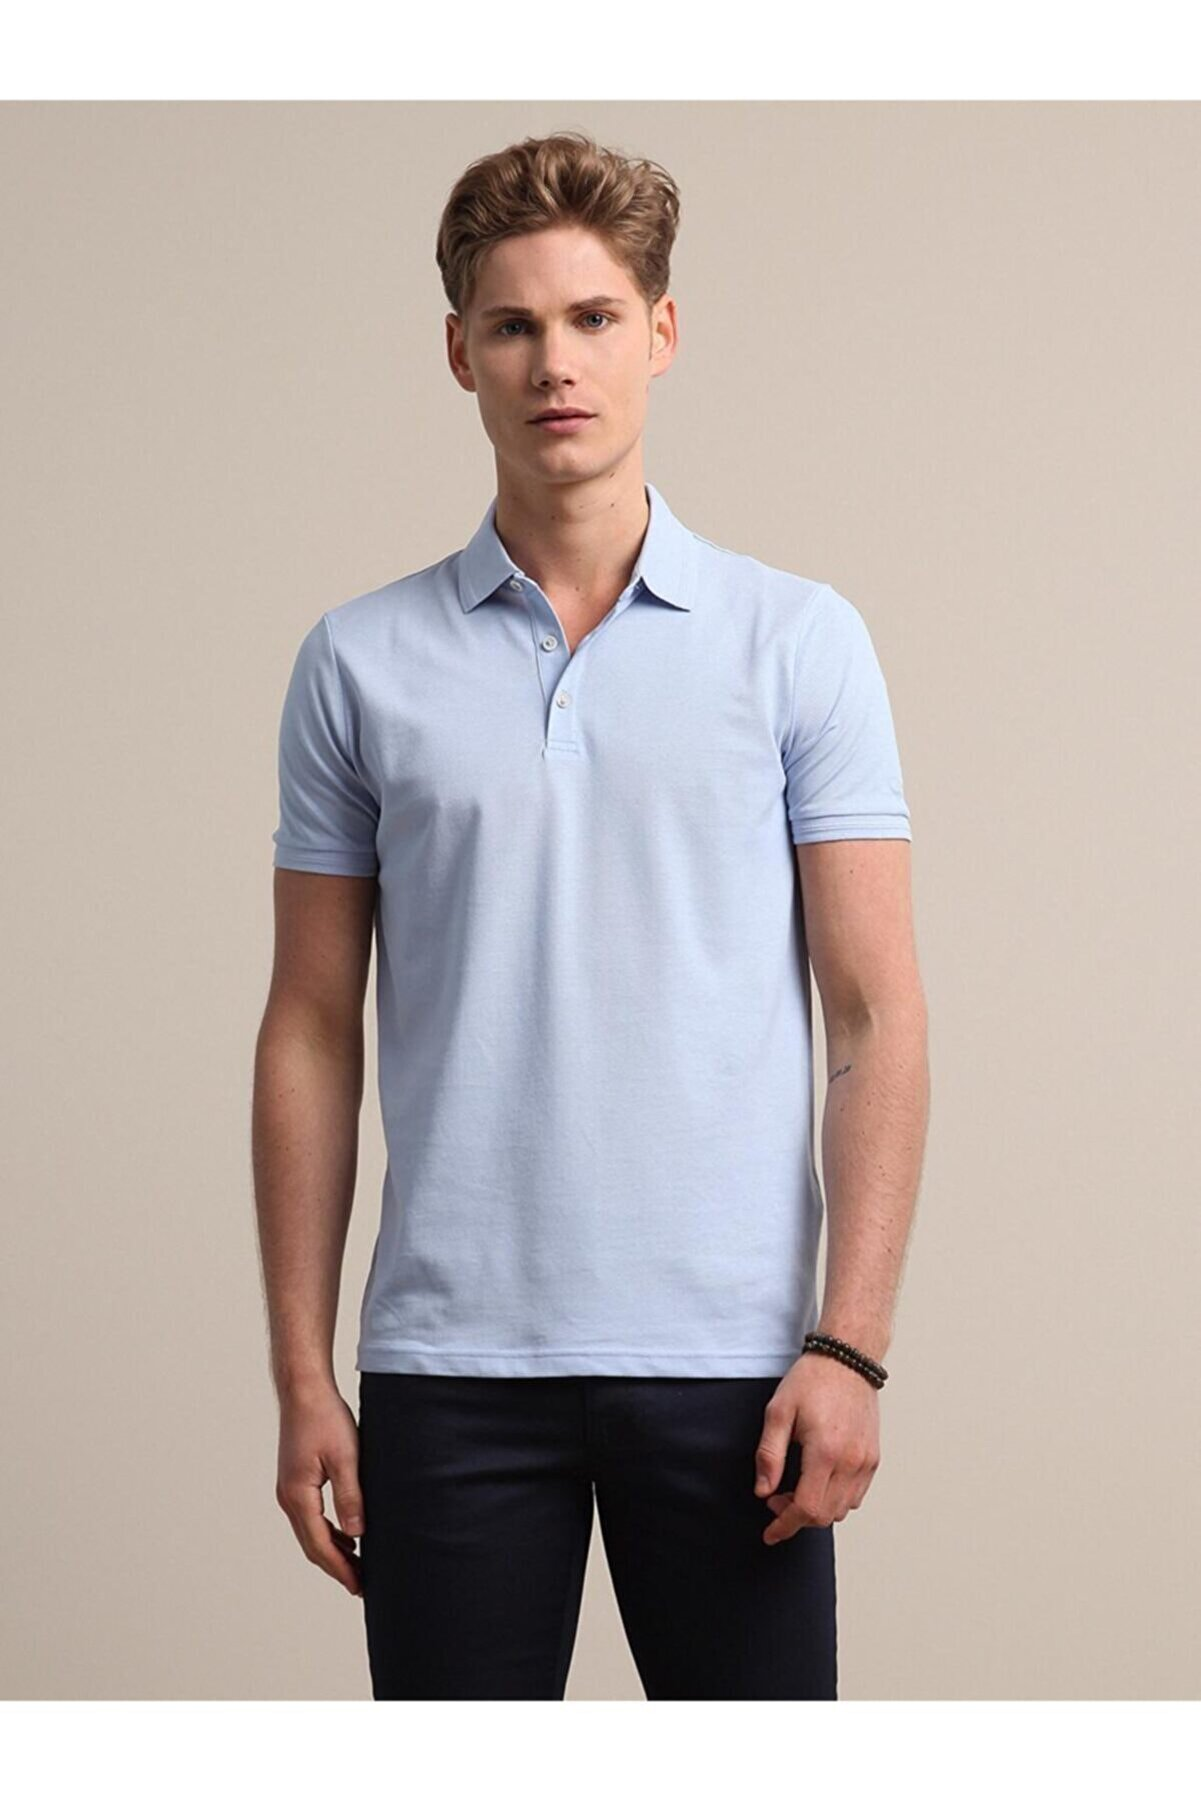 Kip Erkek Mavi Düz Örme T - Shirt KP10120555